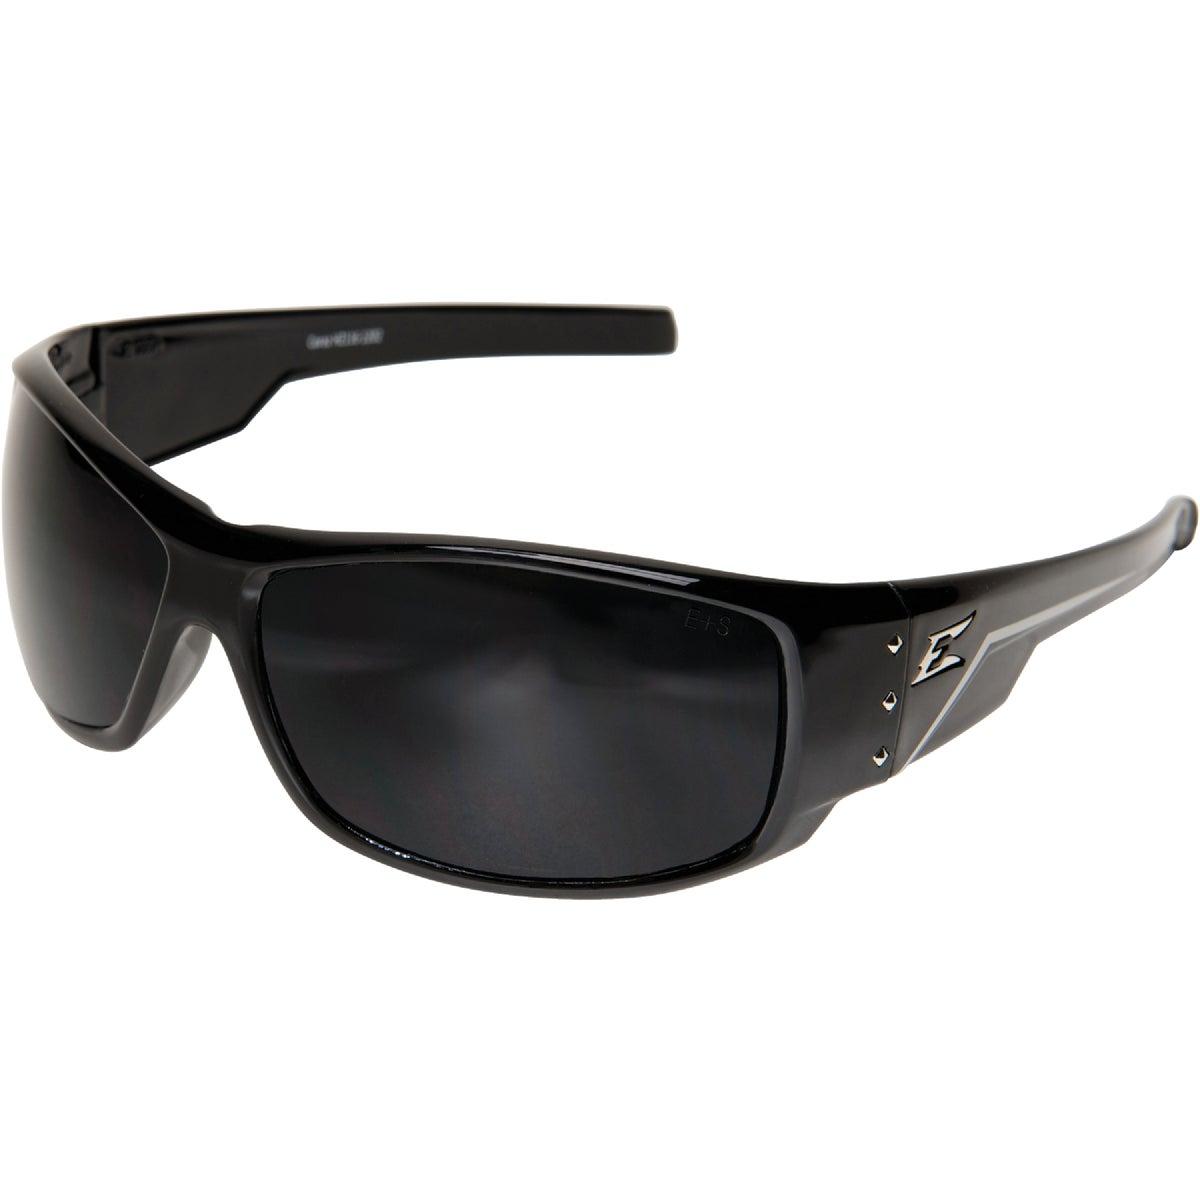 Edge Caraz Safety Glasses